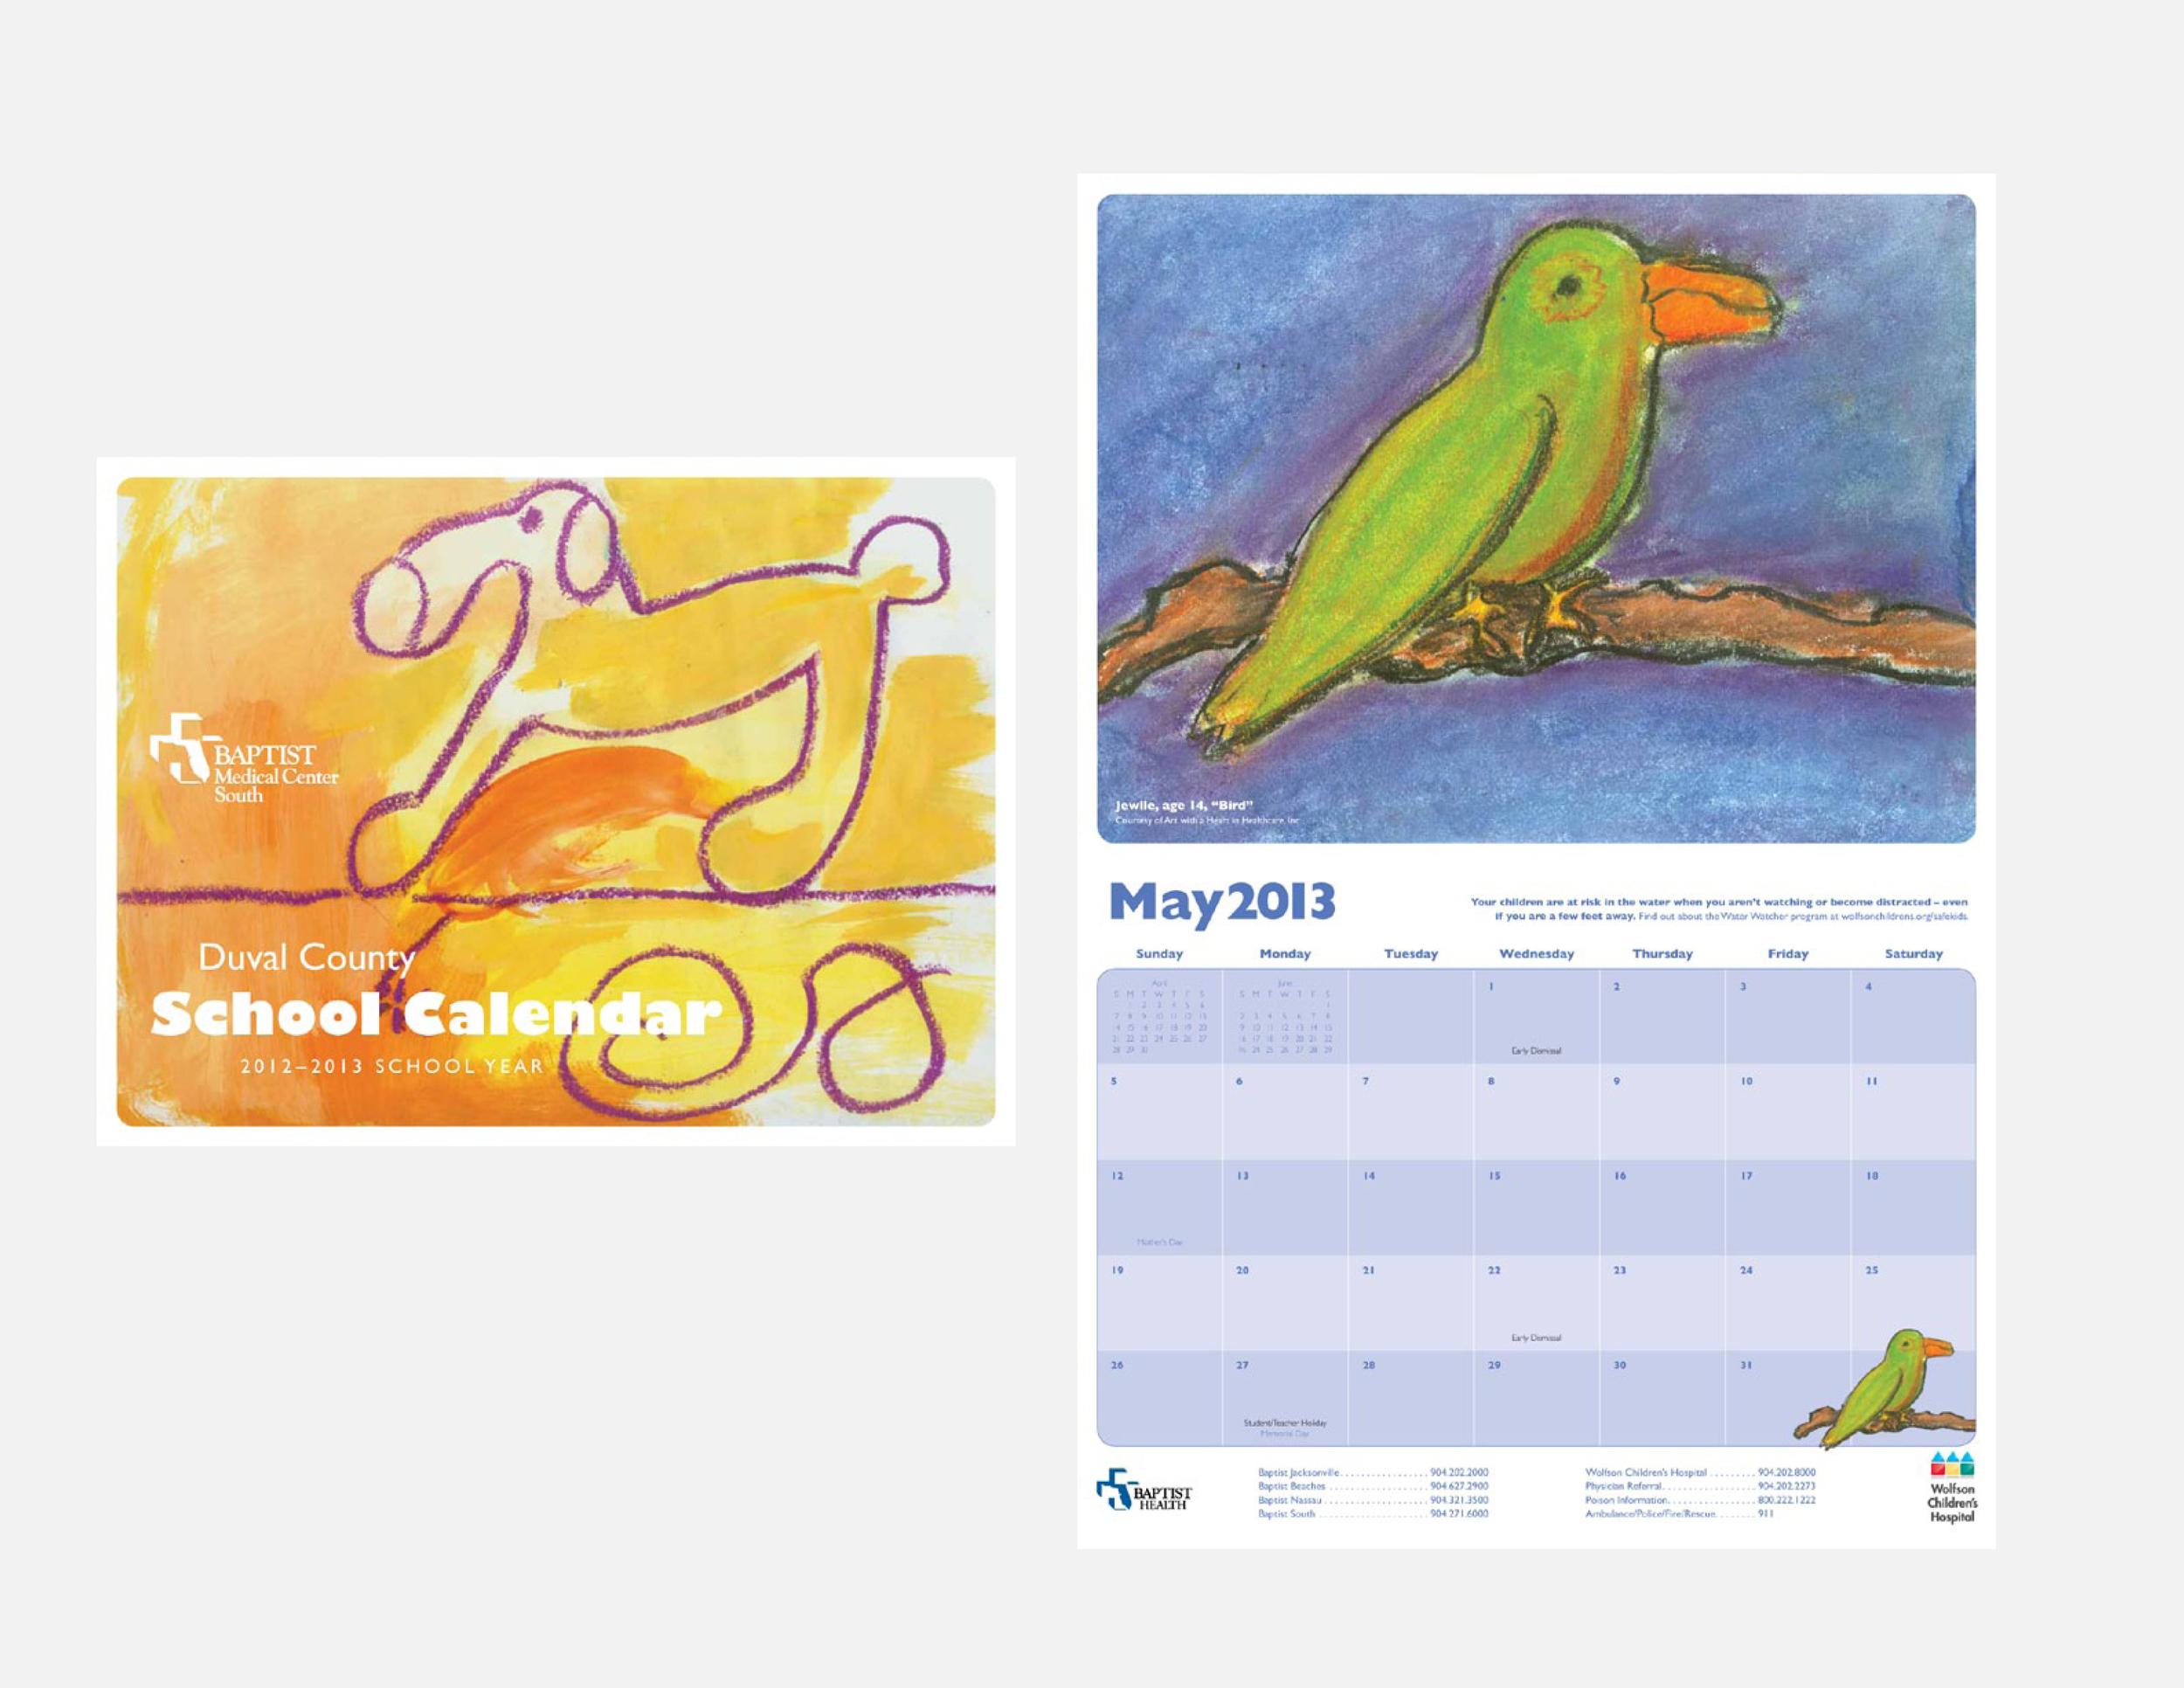 Baptist Health School Calendars